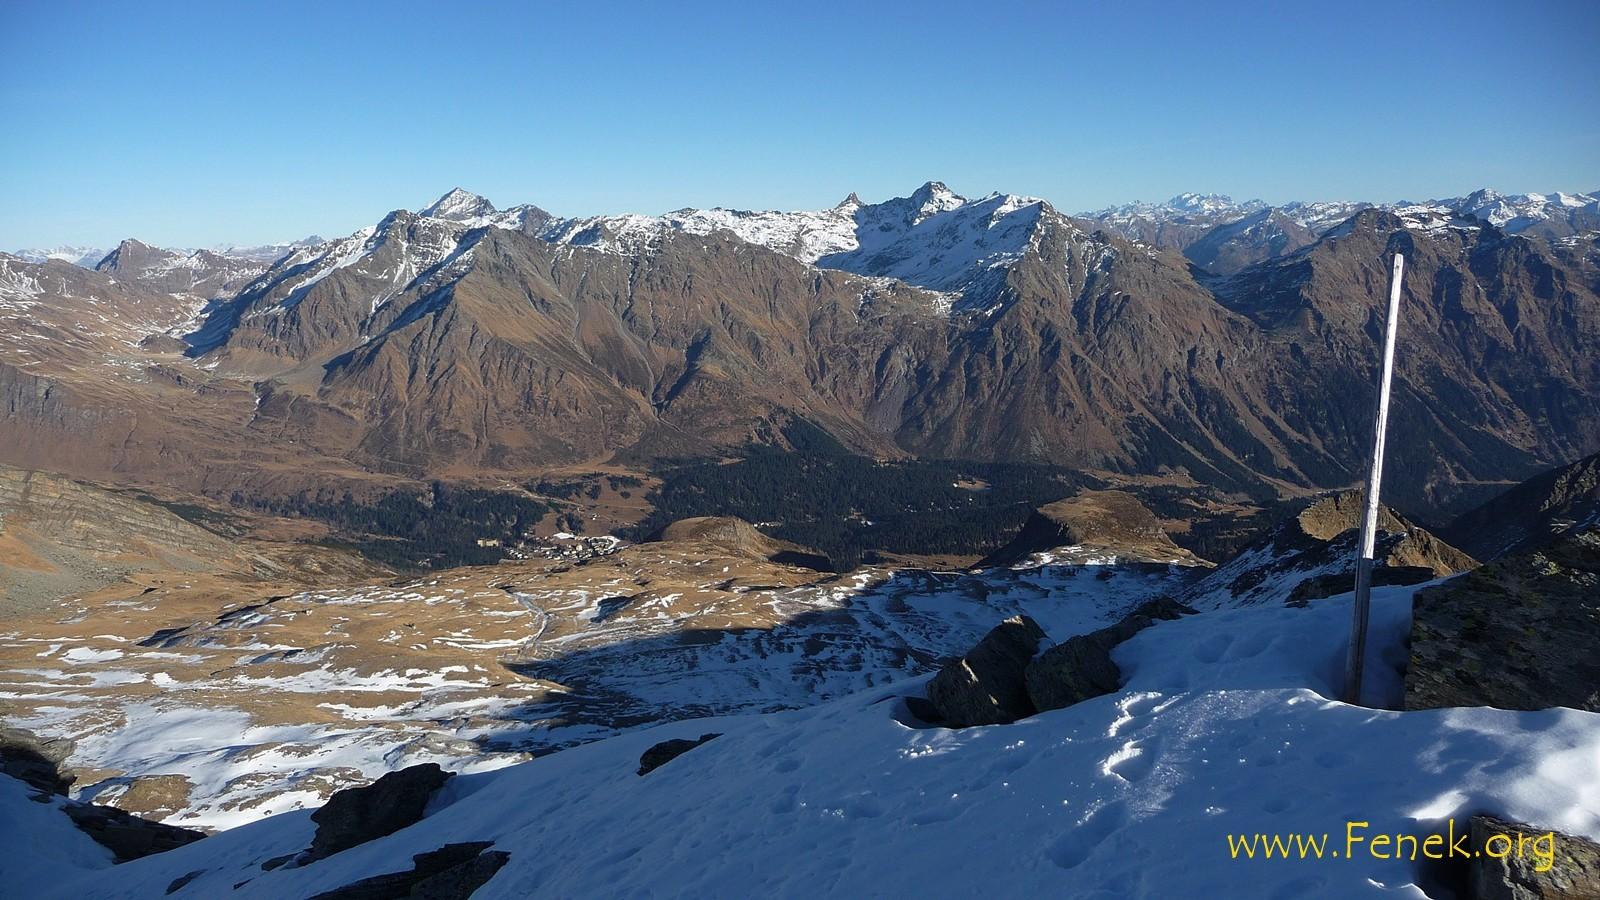 Blick in die Ebene Alp de Confin wo ich aufgestiegen bin. Tief unten San Bernardino